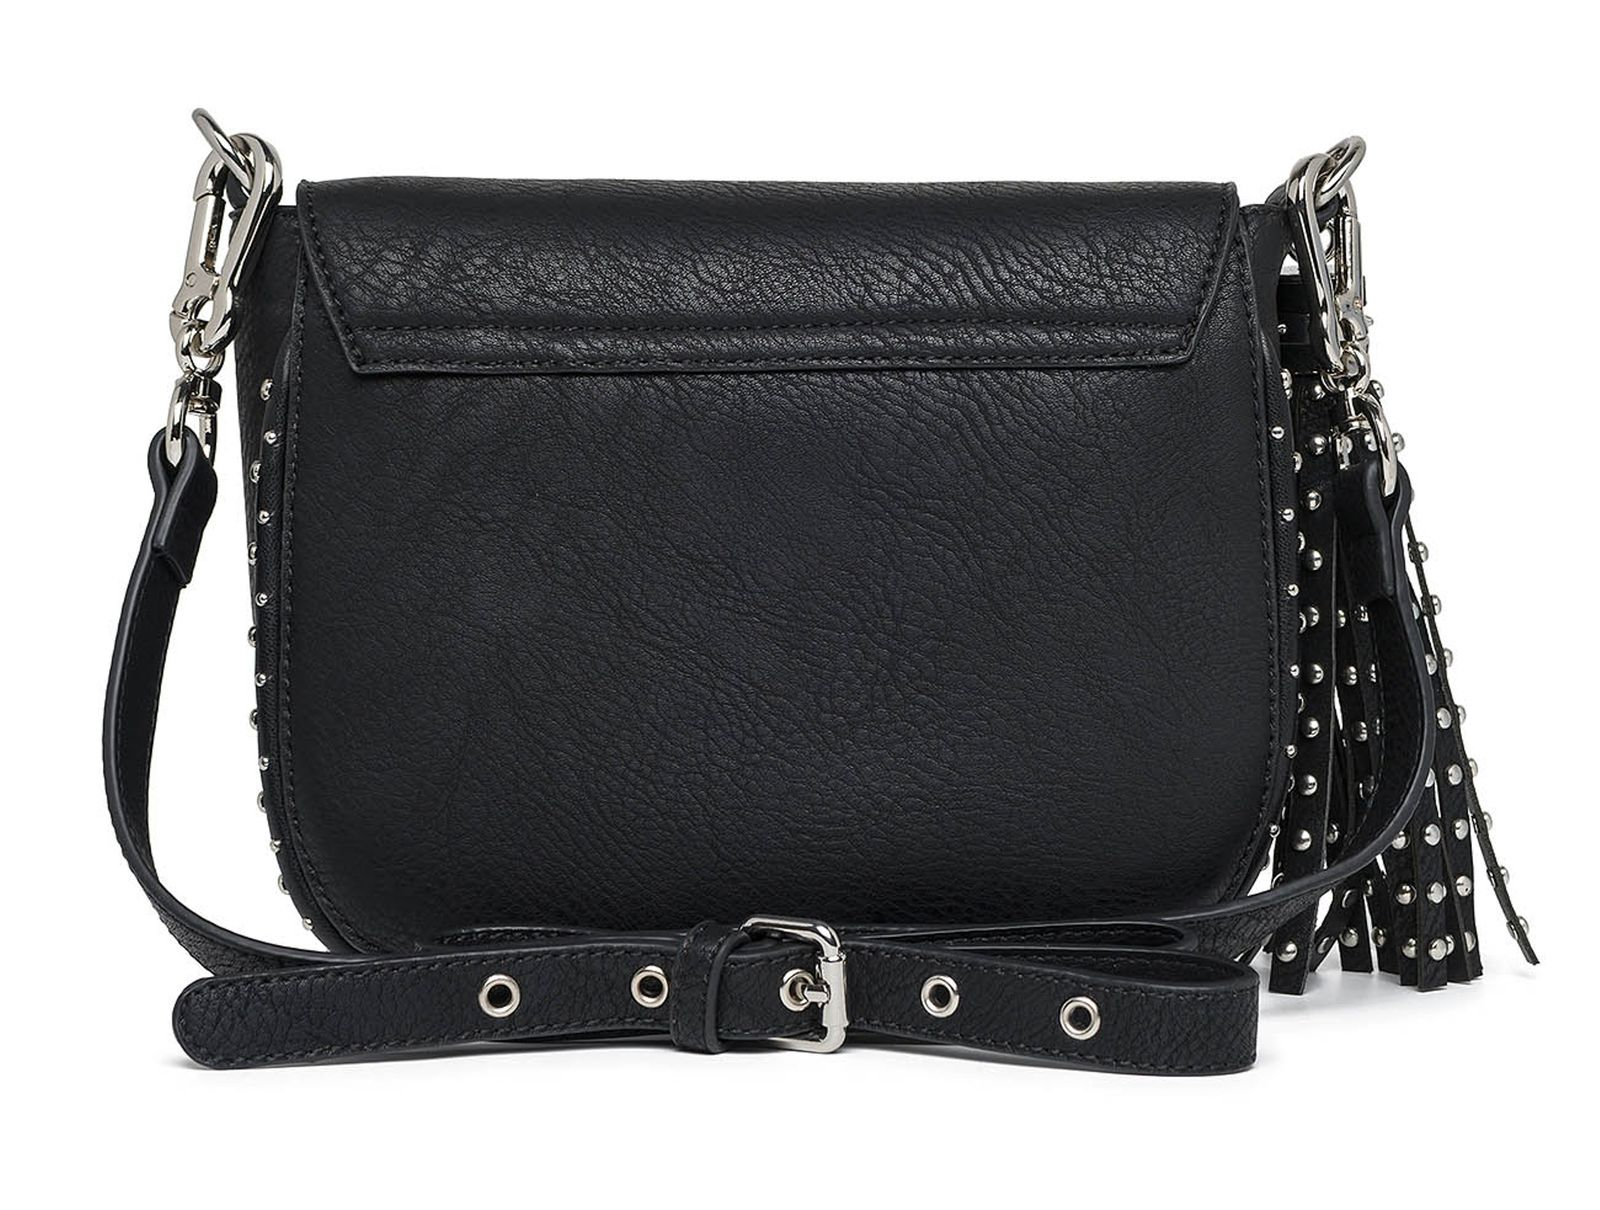 ff12f954acb4 ... To CloseREPLAY Eco-Leather Crossbody Bag Black   99